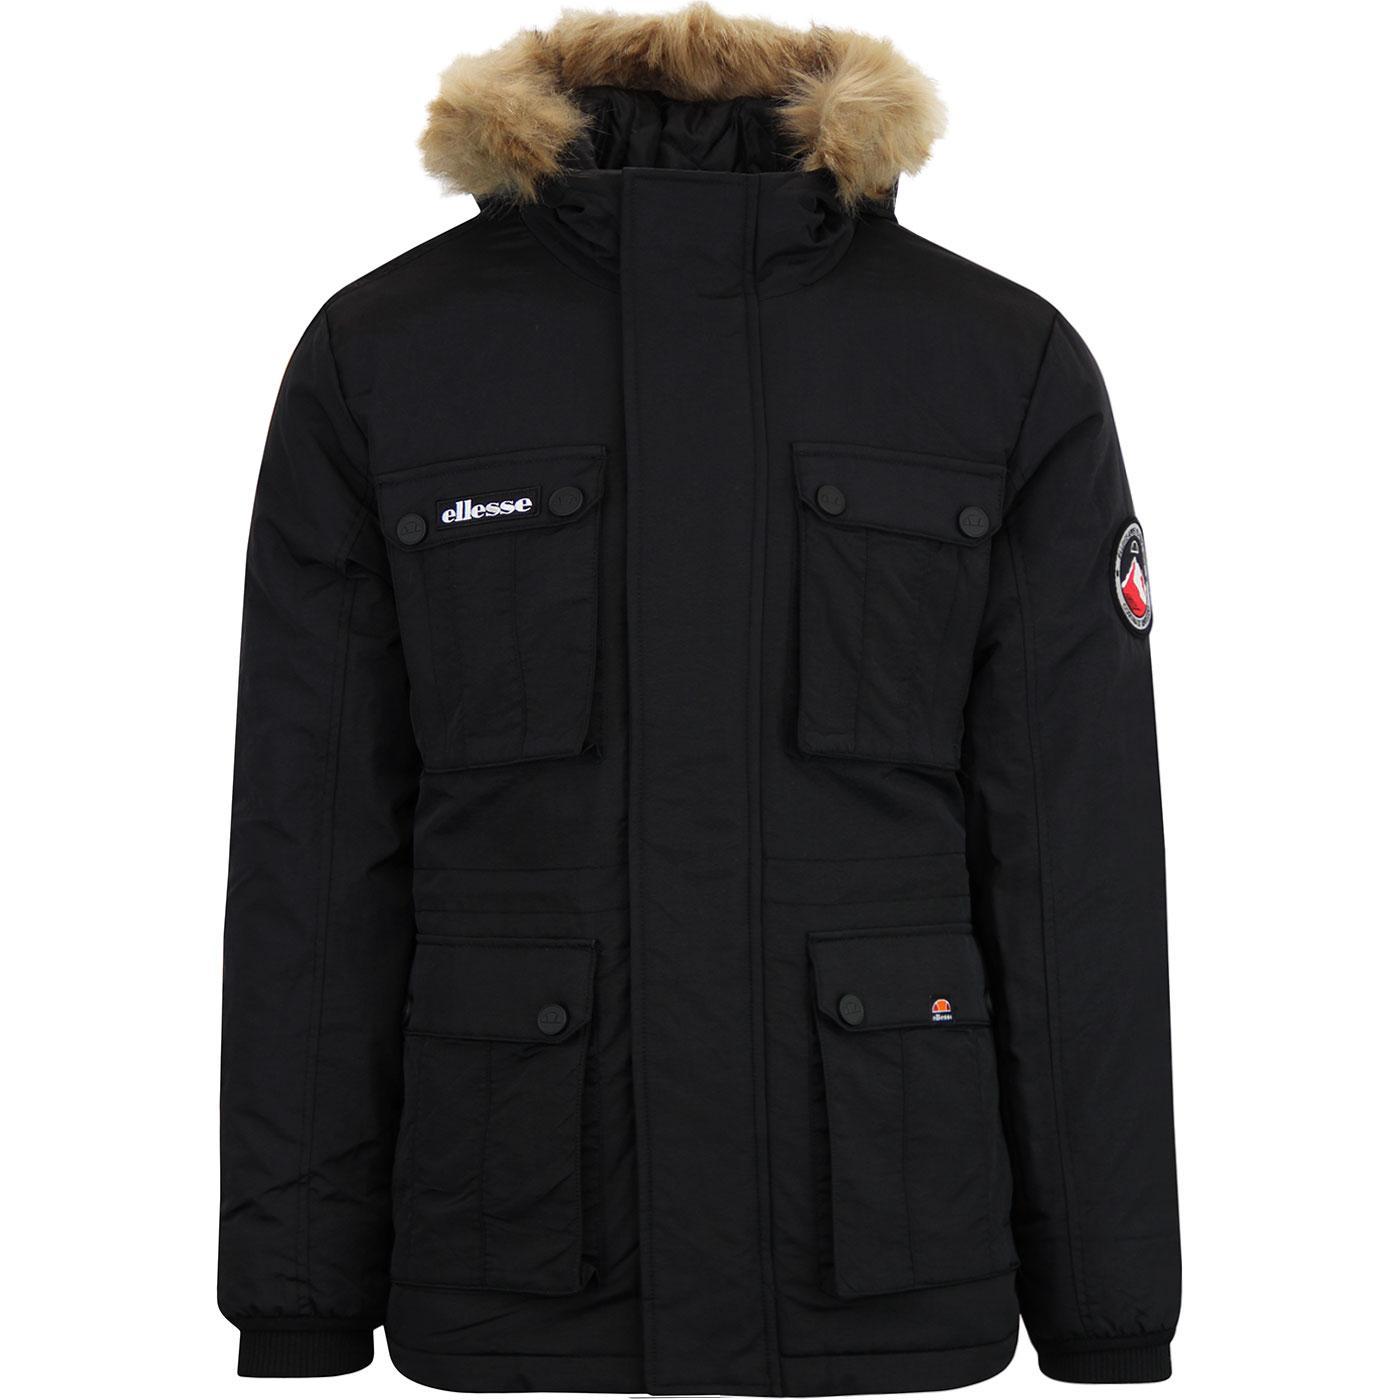 Ampetrini ELLESSE Retro 90s Snorkel Parka Jacket